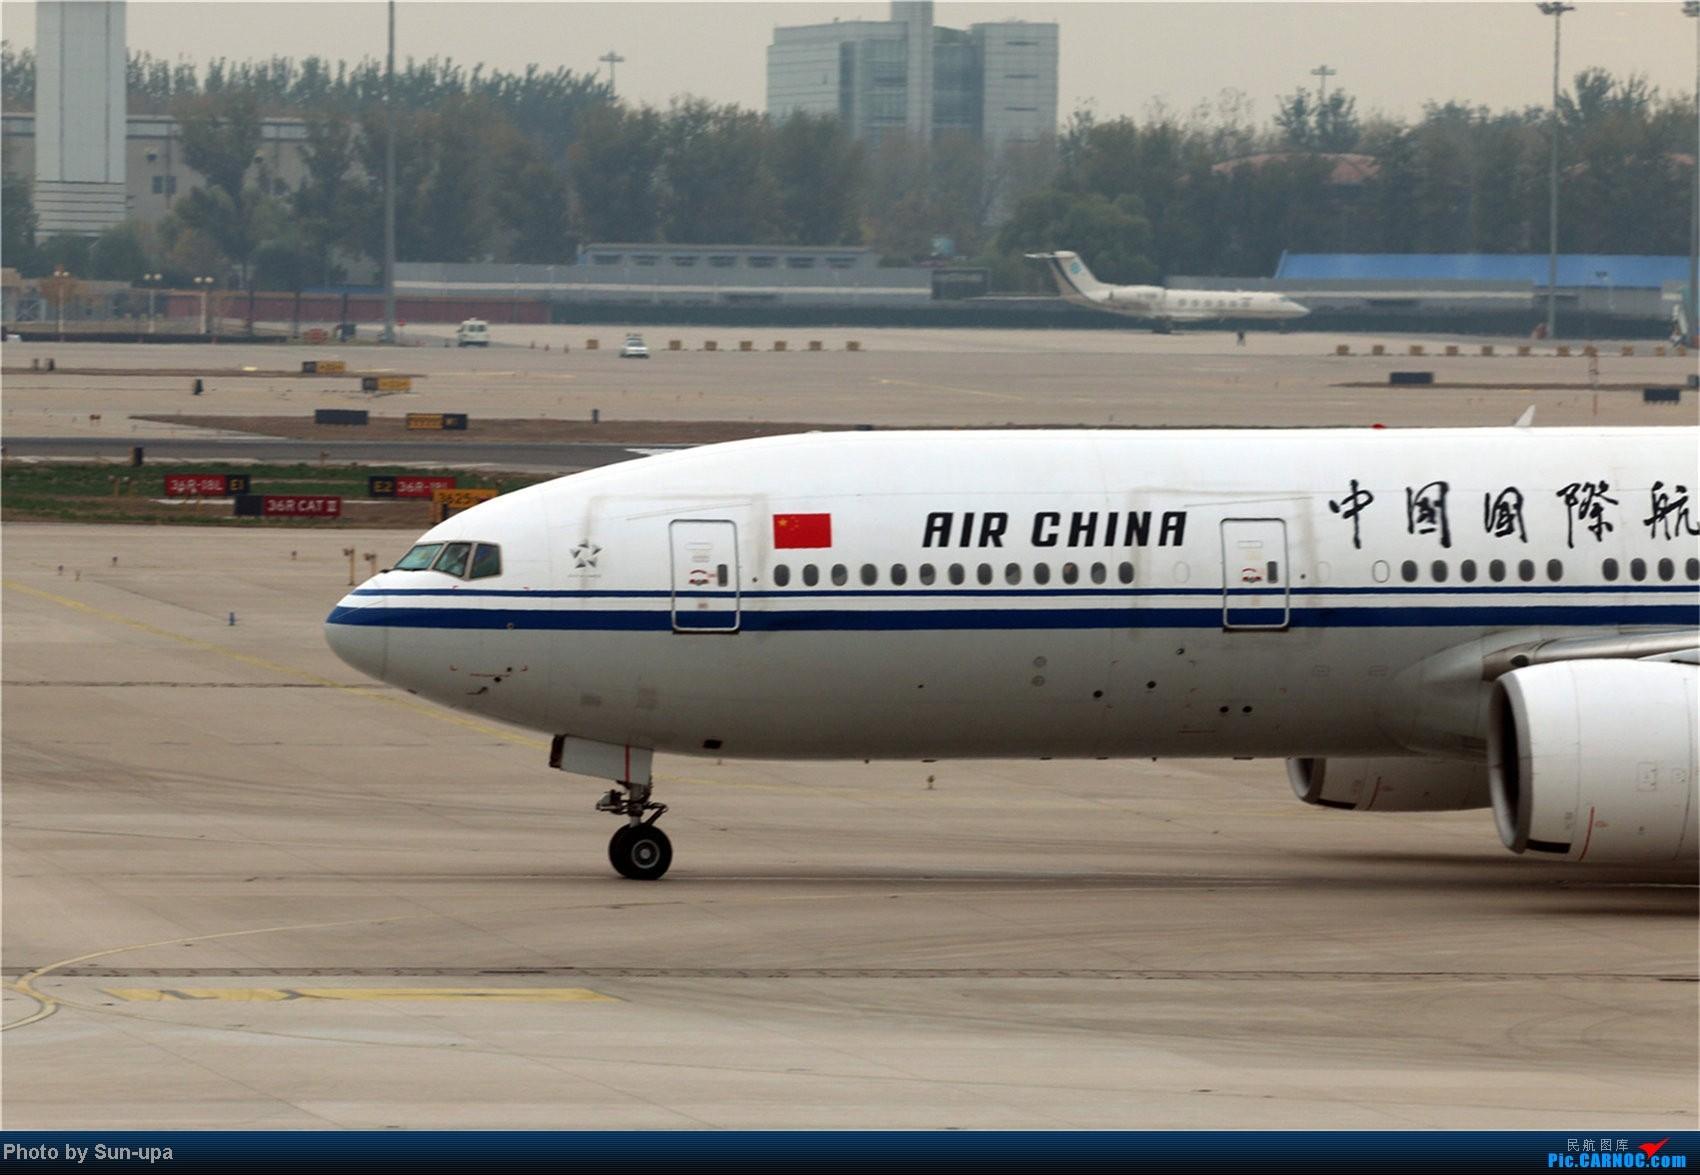 Re:[原创]【Sun-upa】老图新发 前段时间pek杂图+11.7机场内随拍 BOEING 777-200